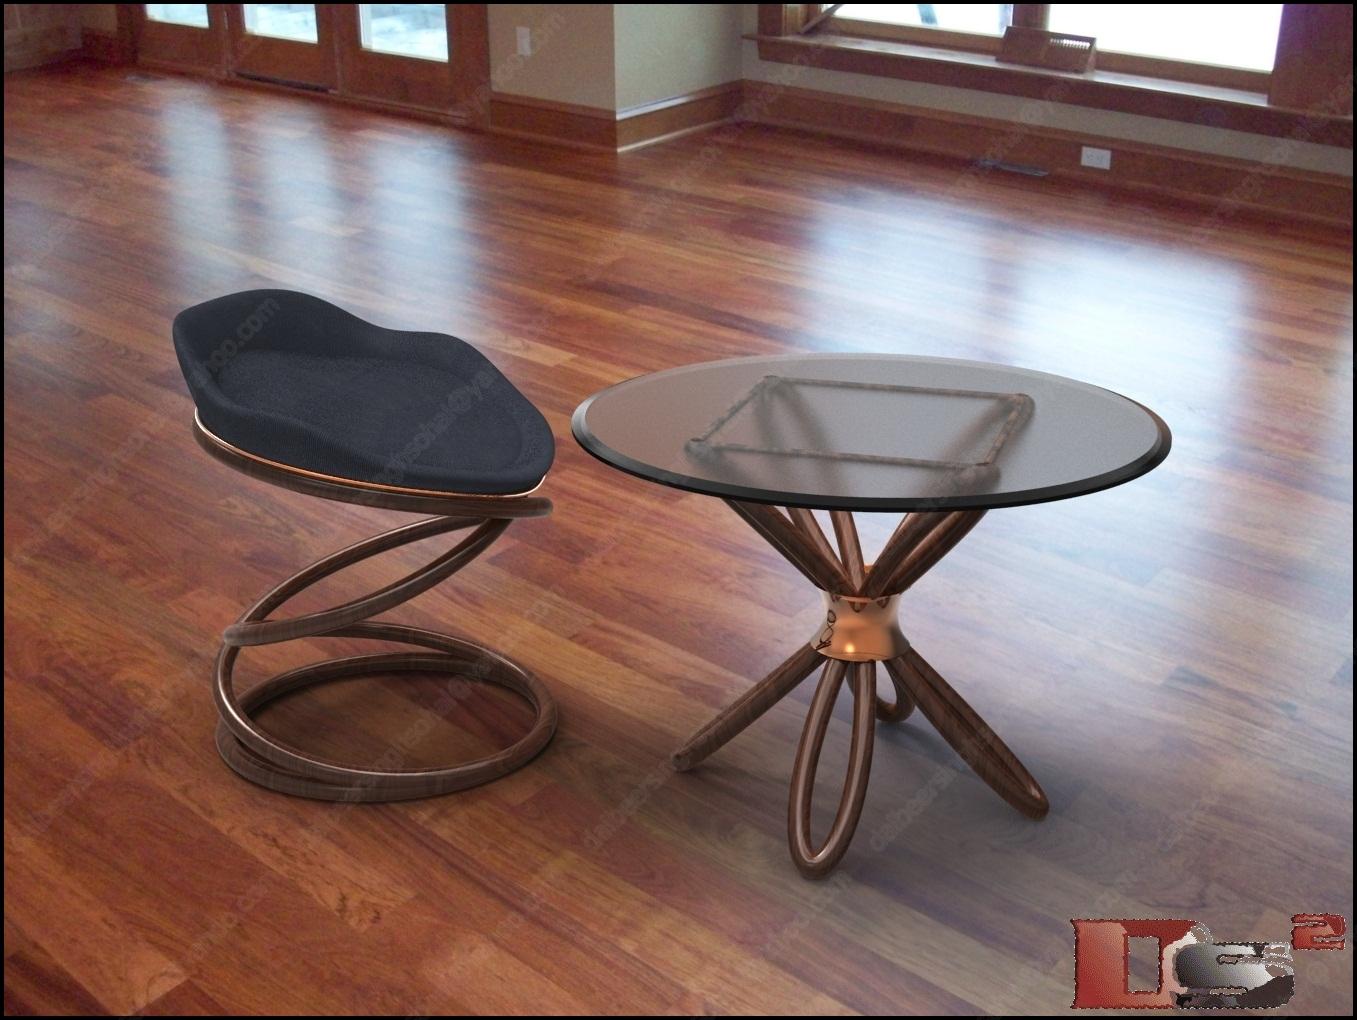 chair_table(1).jpg